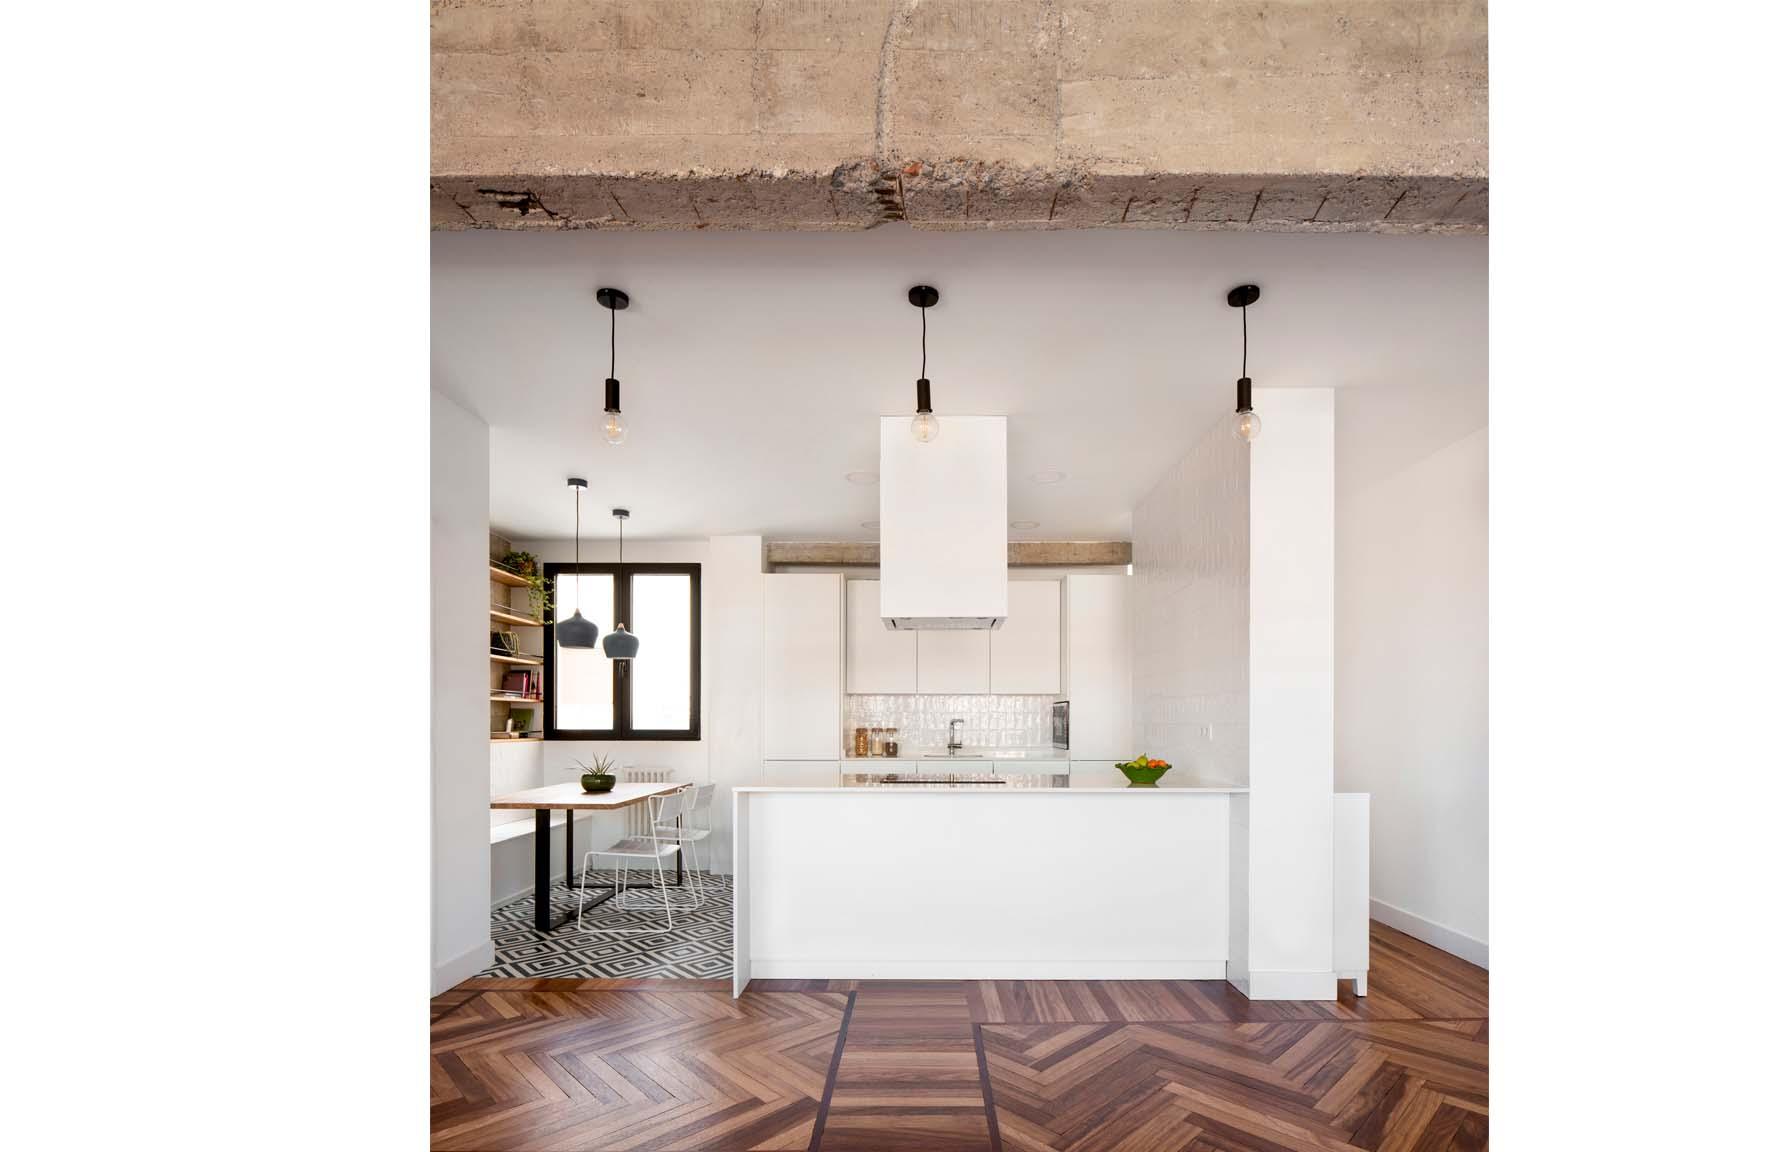 Apartment Areilza-Bilbao-Image 01.jpg